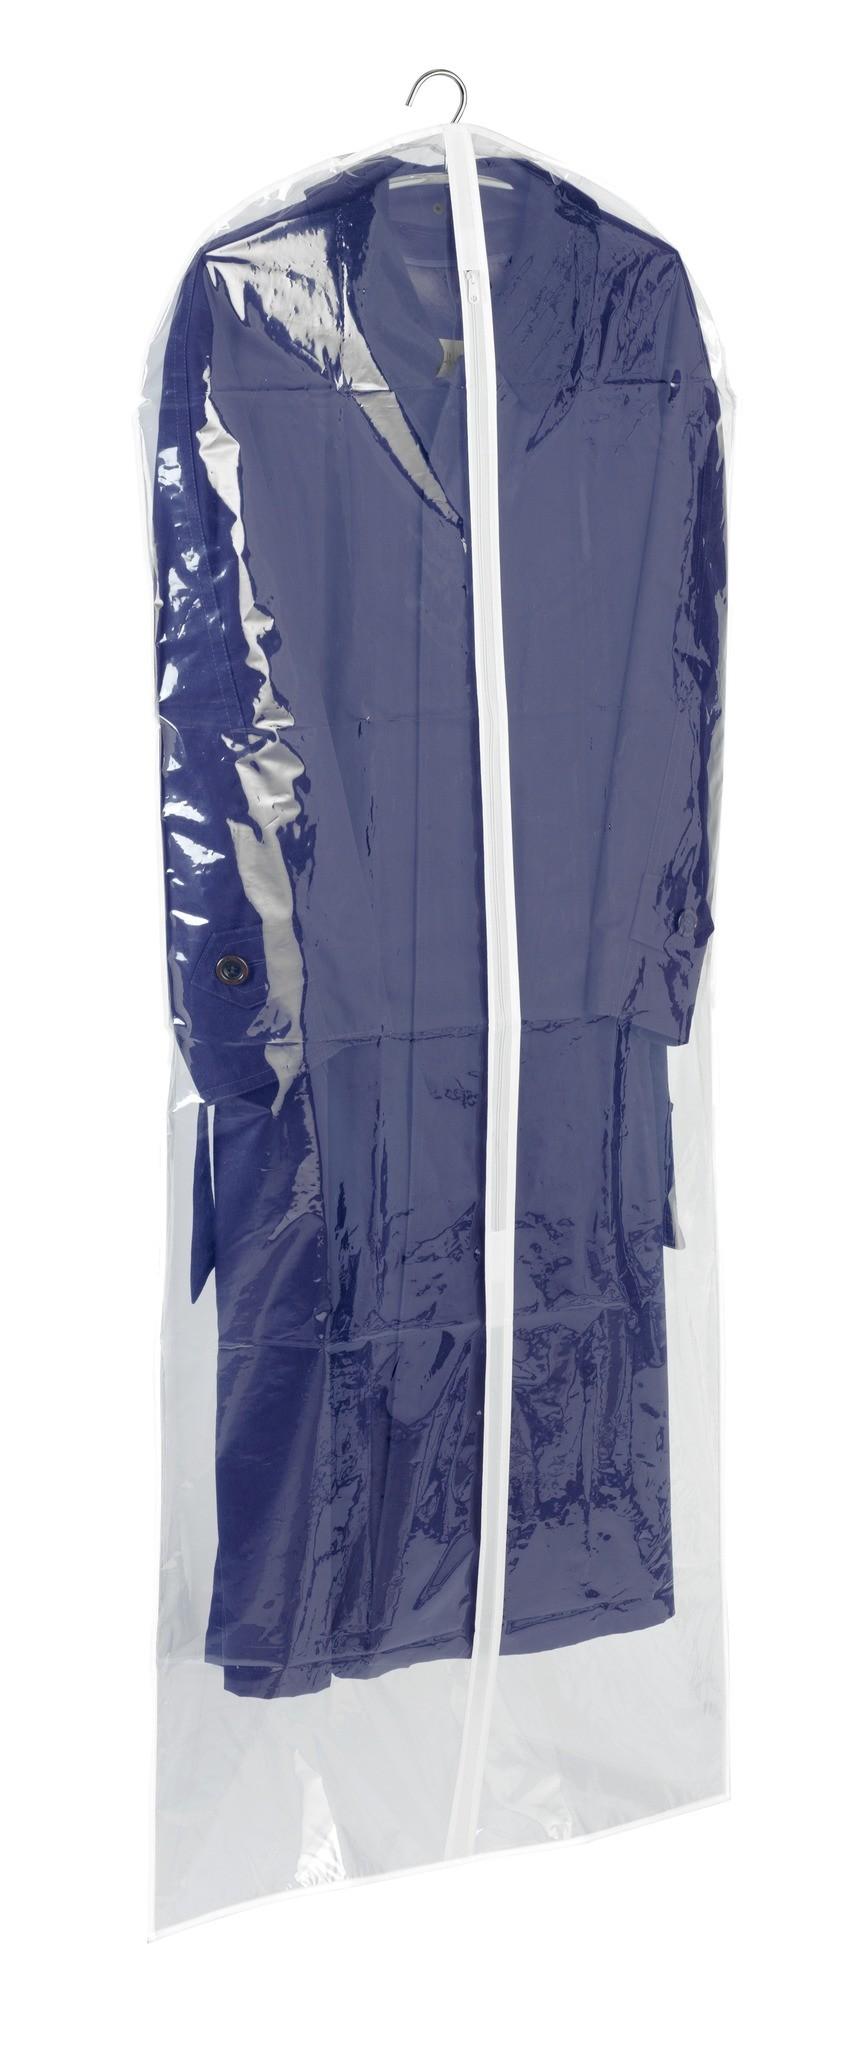 Kleidersack Transparent 100x60 cm, 10er Set